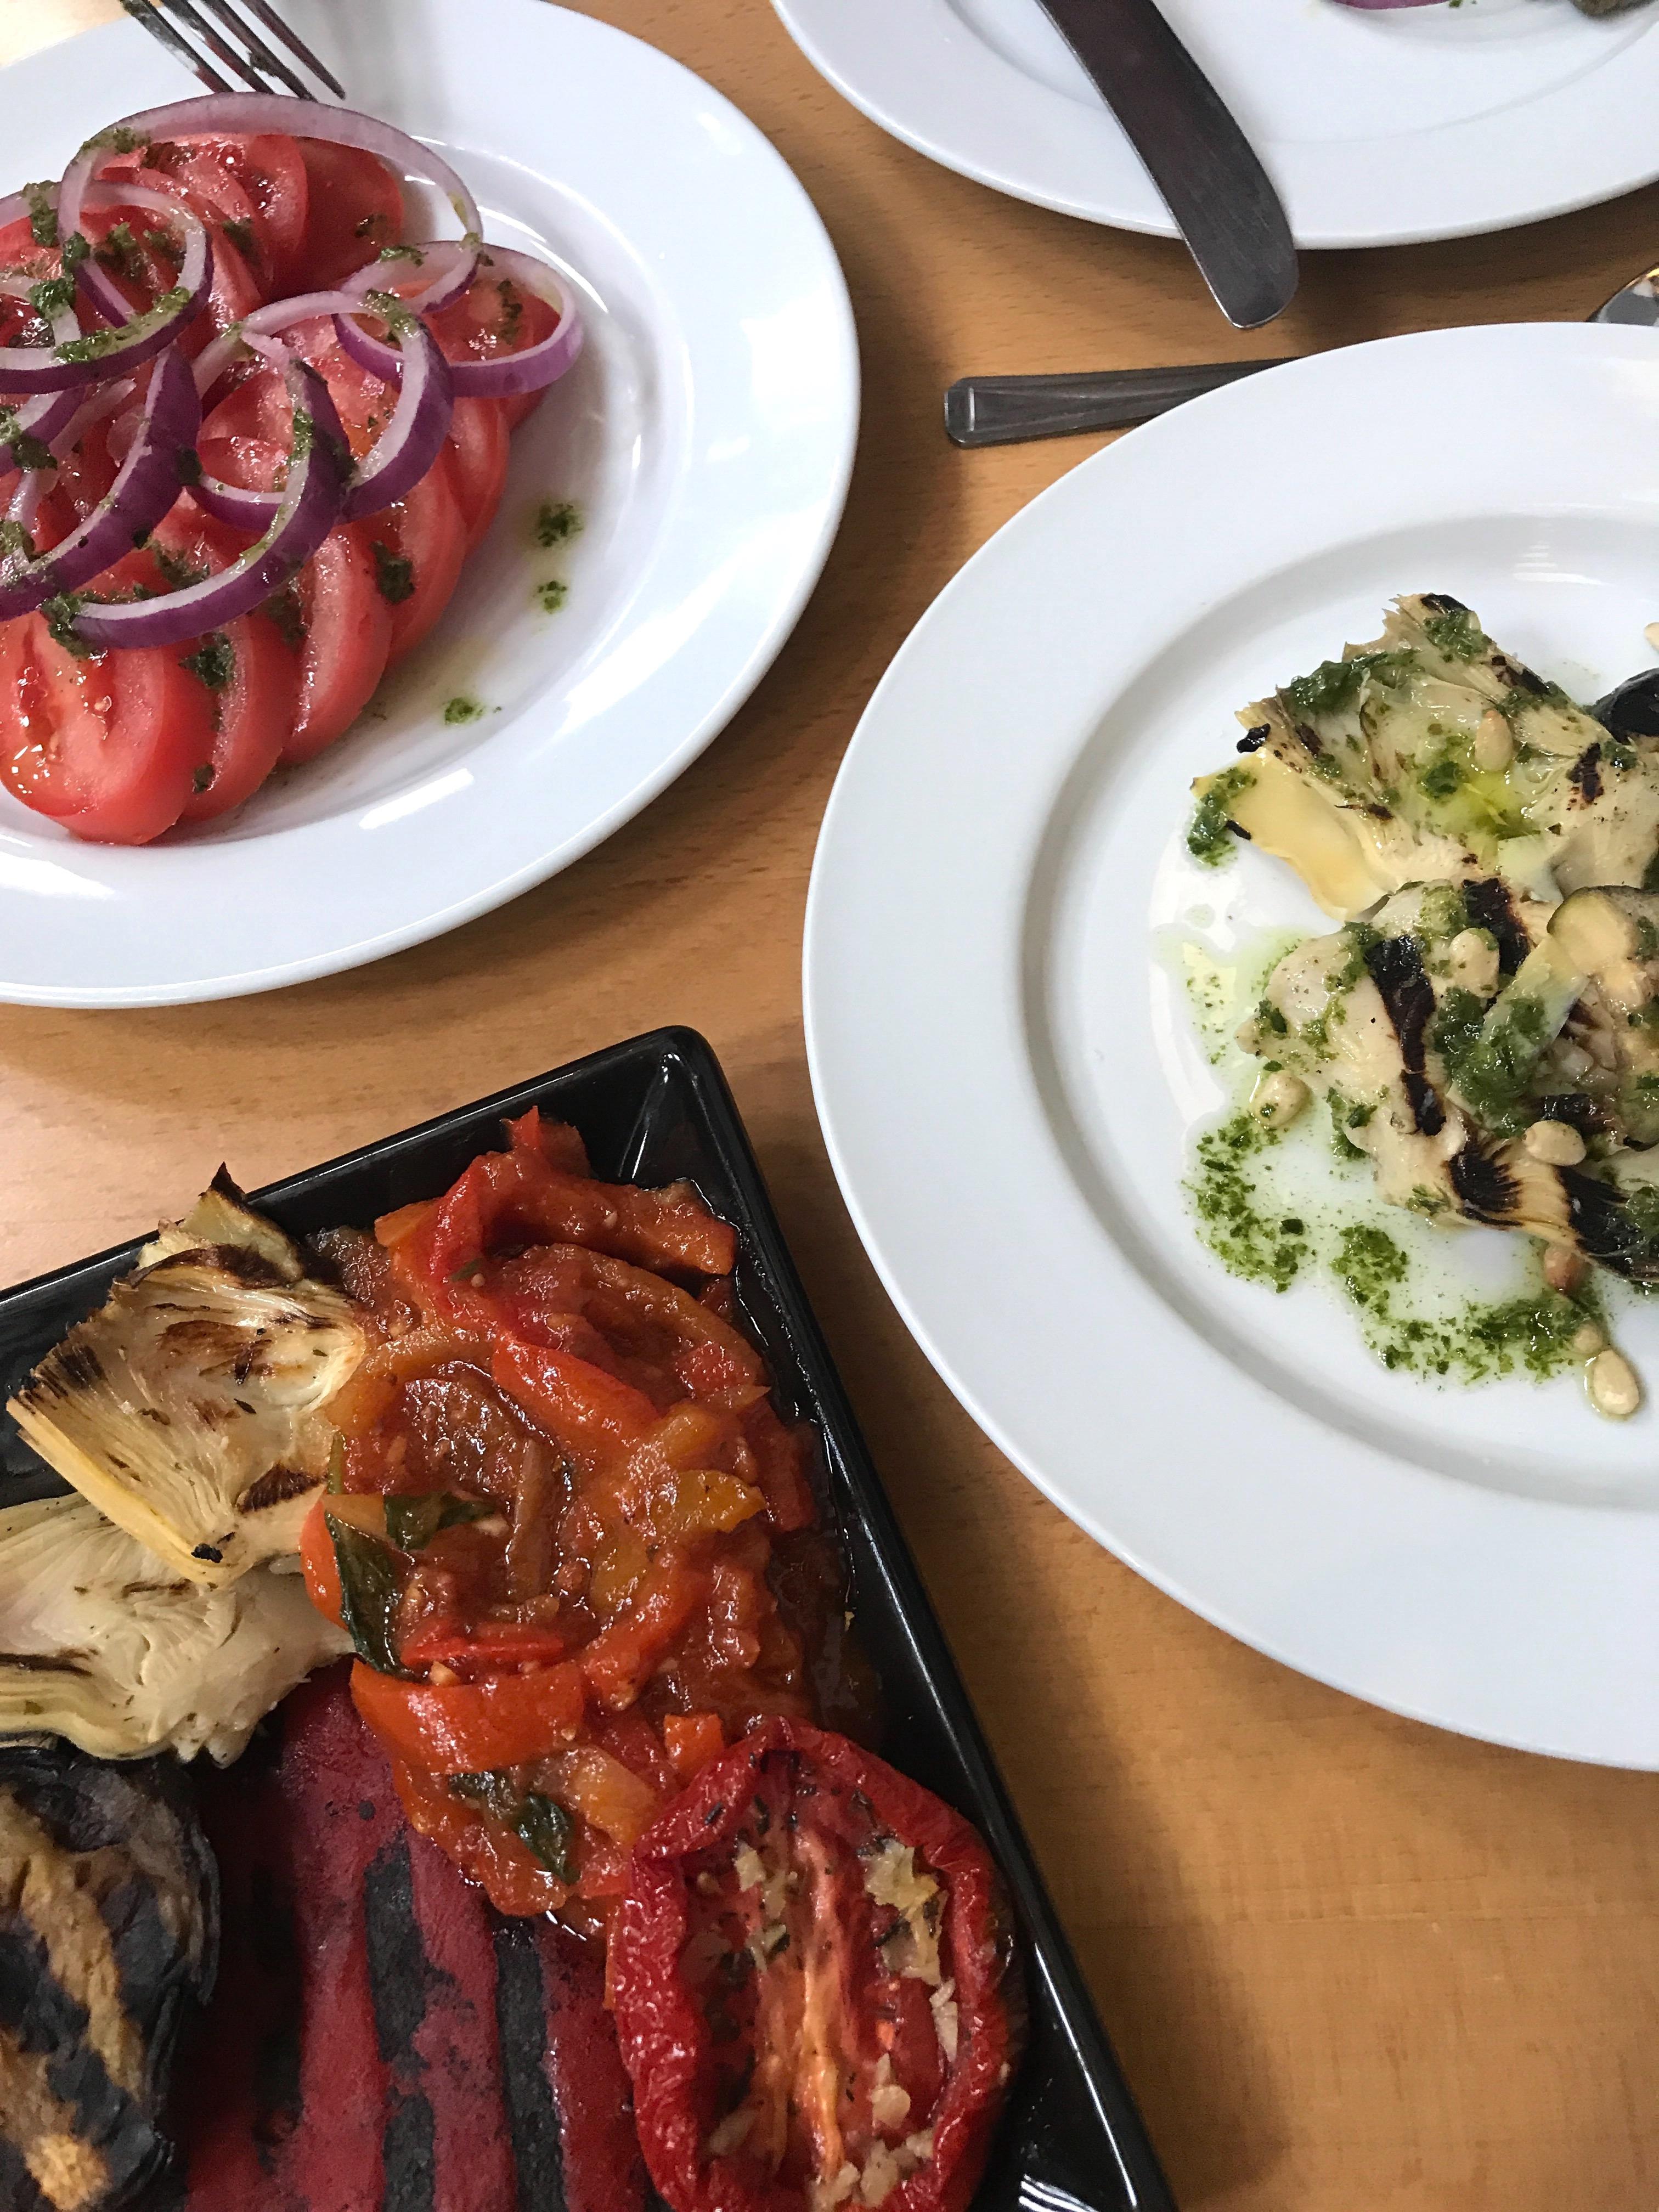 Vegan Options at Nuovo